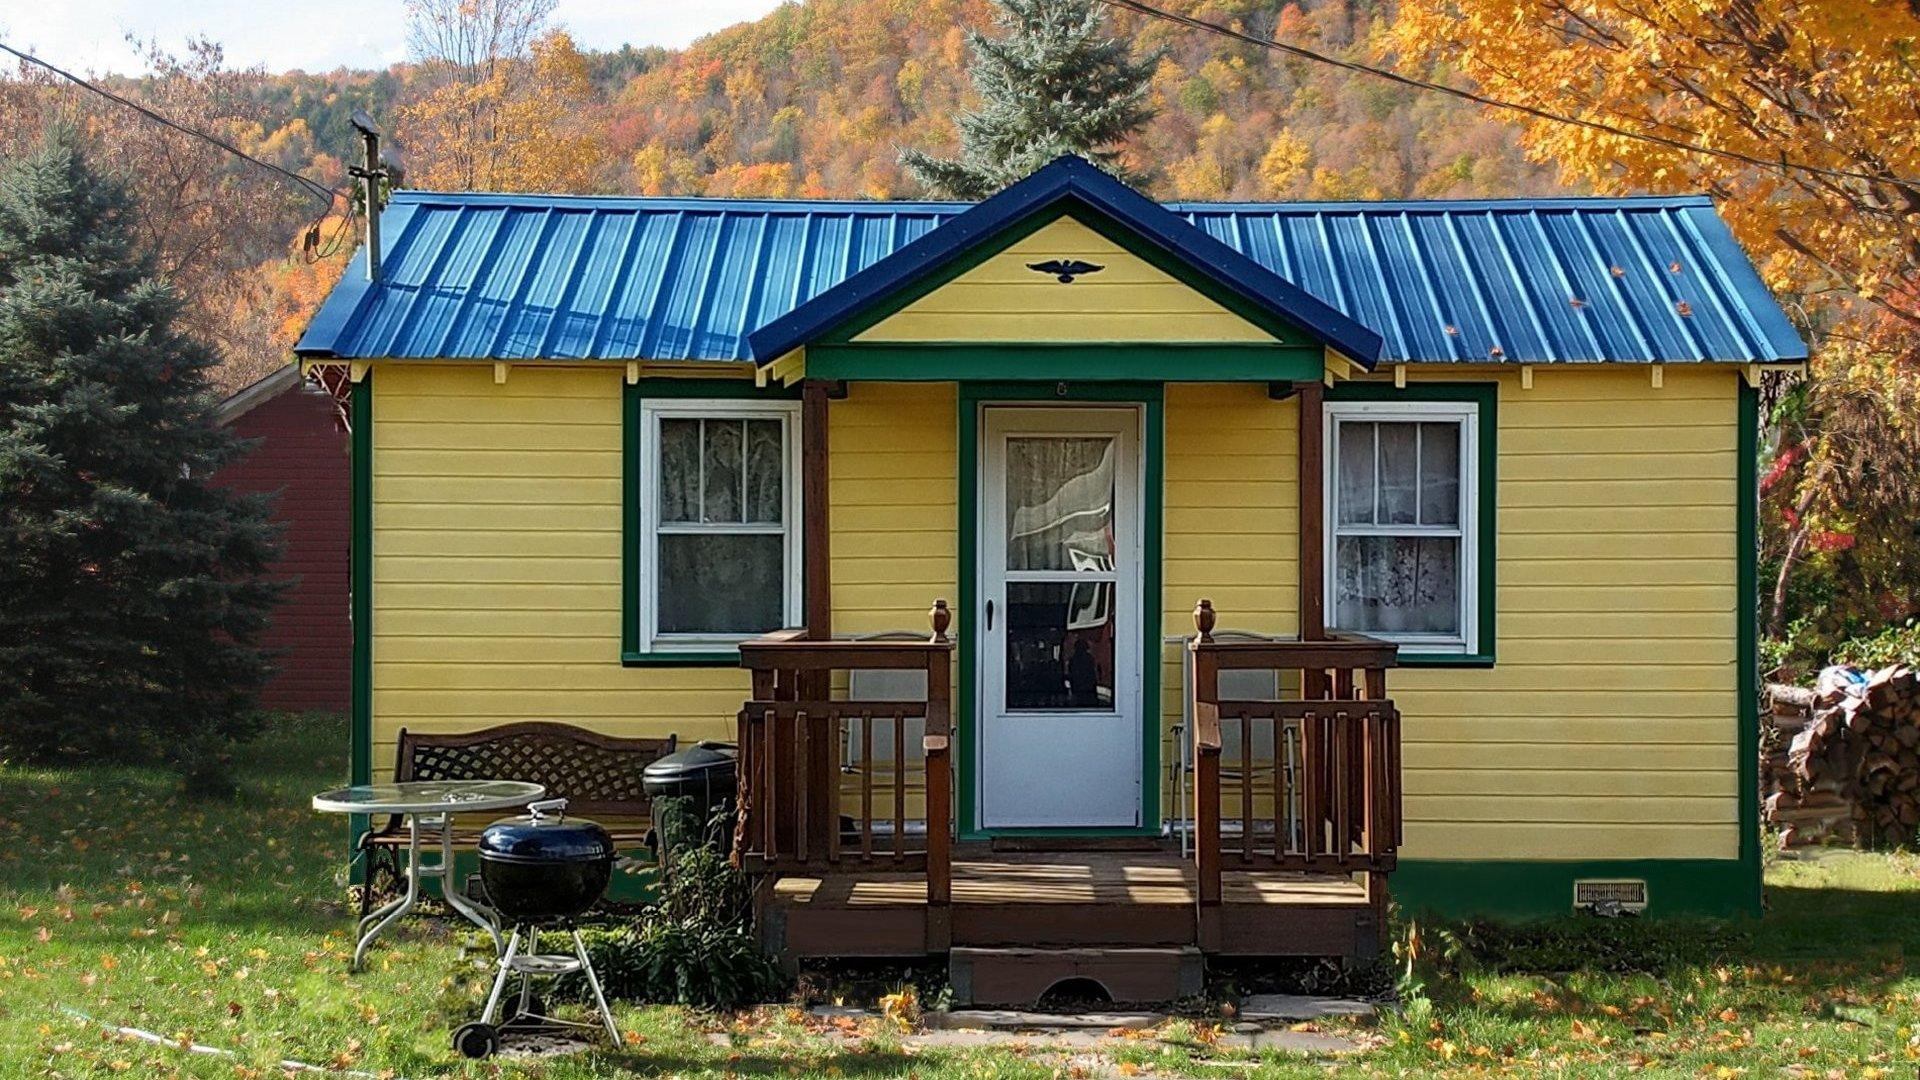 Phenomenal Catskill Bungalow Tiny House Vacation Rental Small Cabin Beutiful Home Inspiration Semekurdistantinfo